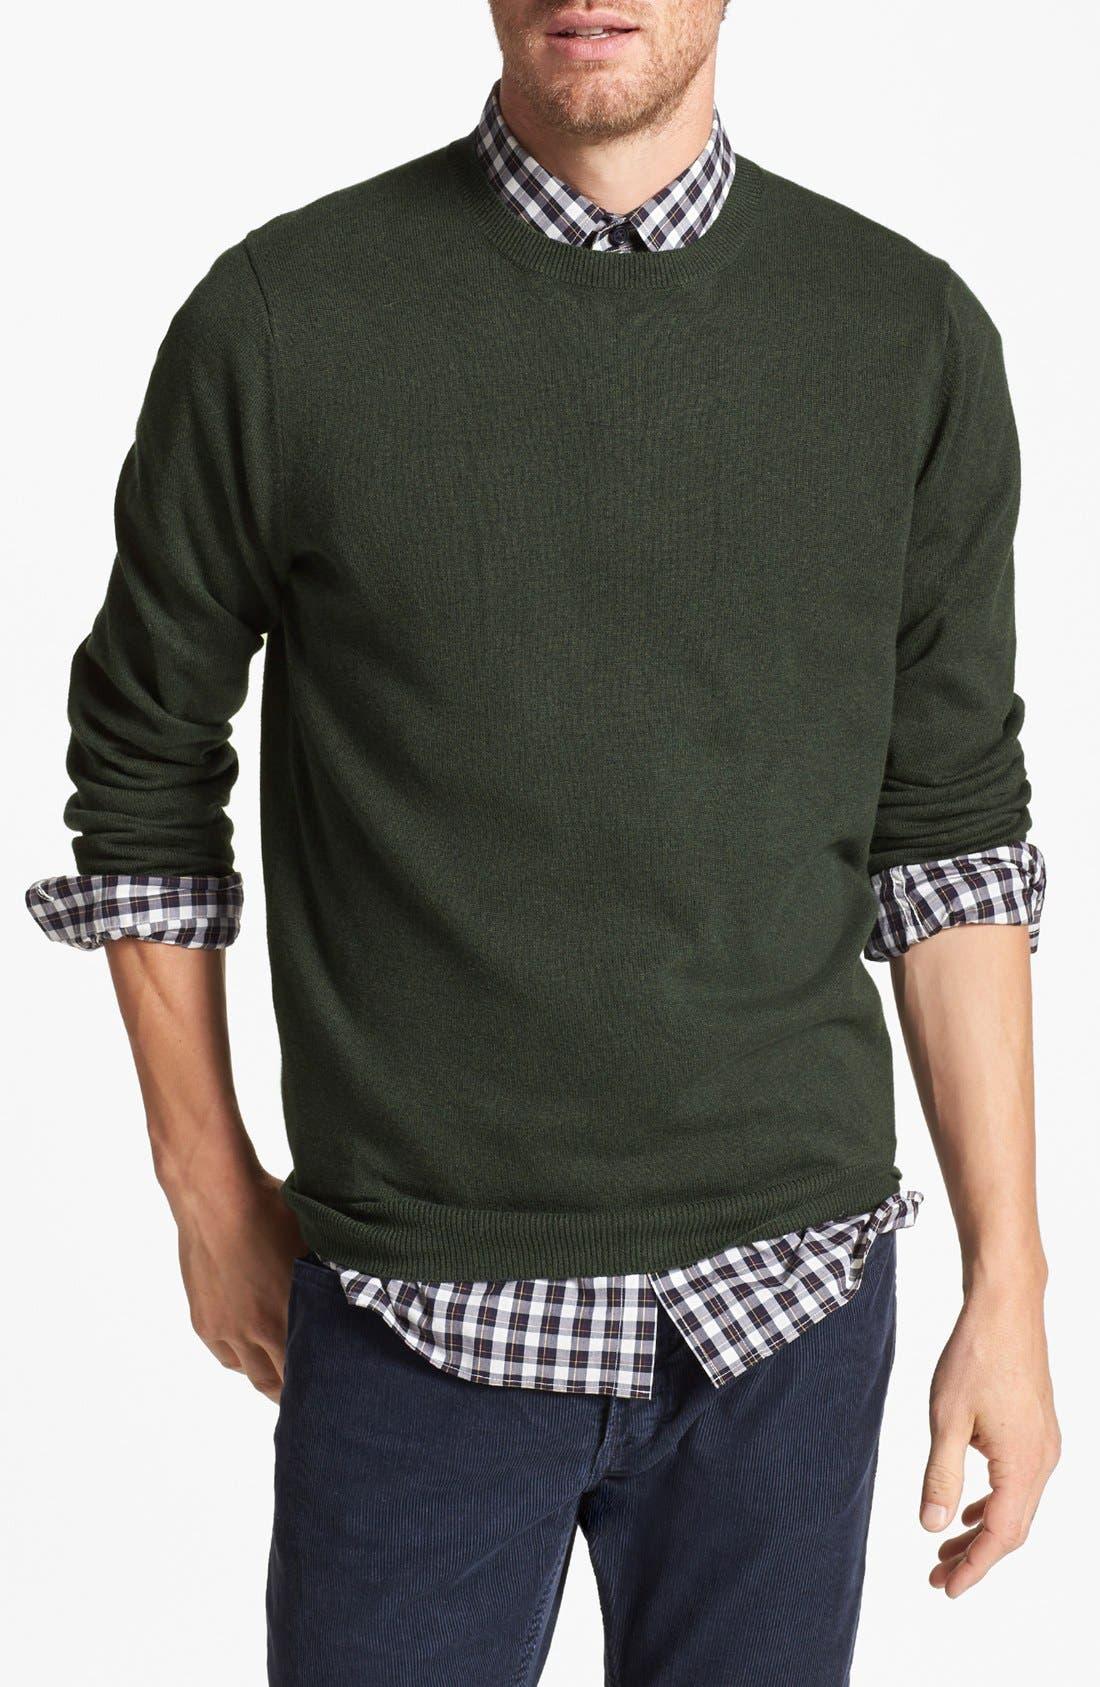 Main Image - Wallin & Bros. Trim Fit Cotton & Cashmere Crewneck Sweater